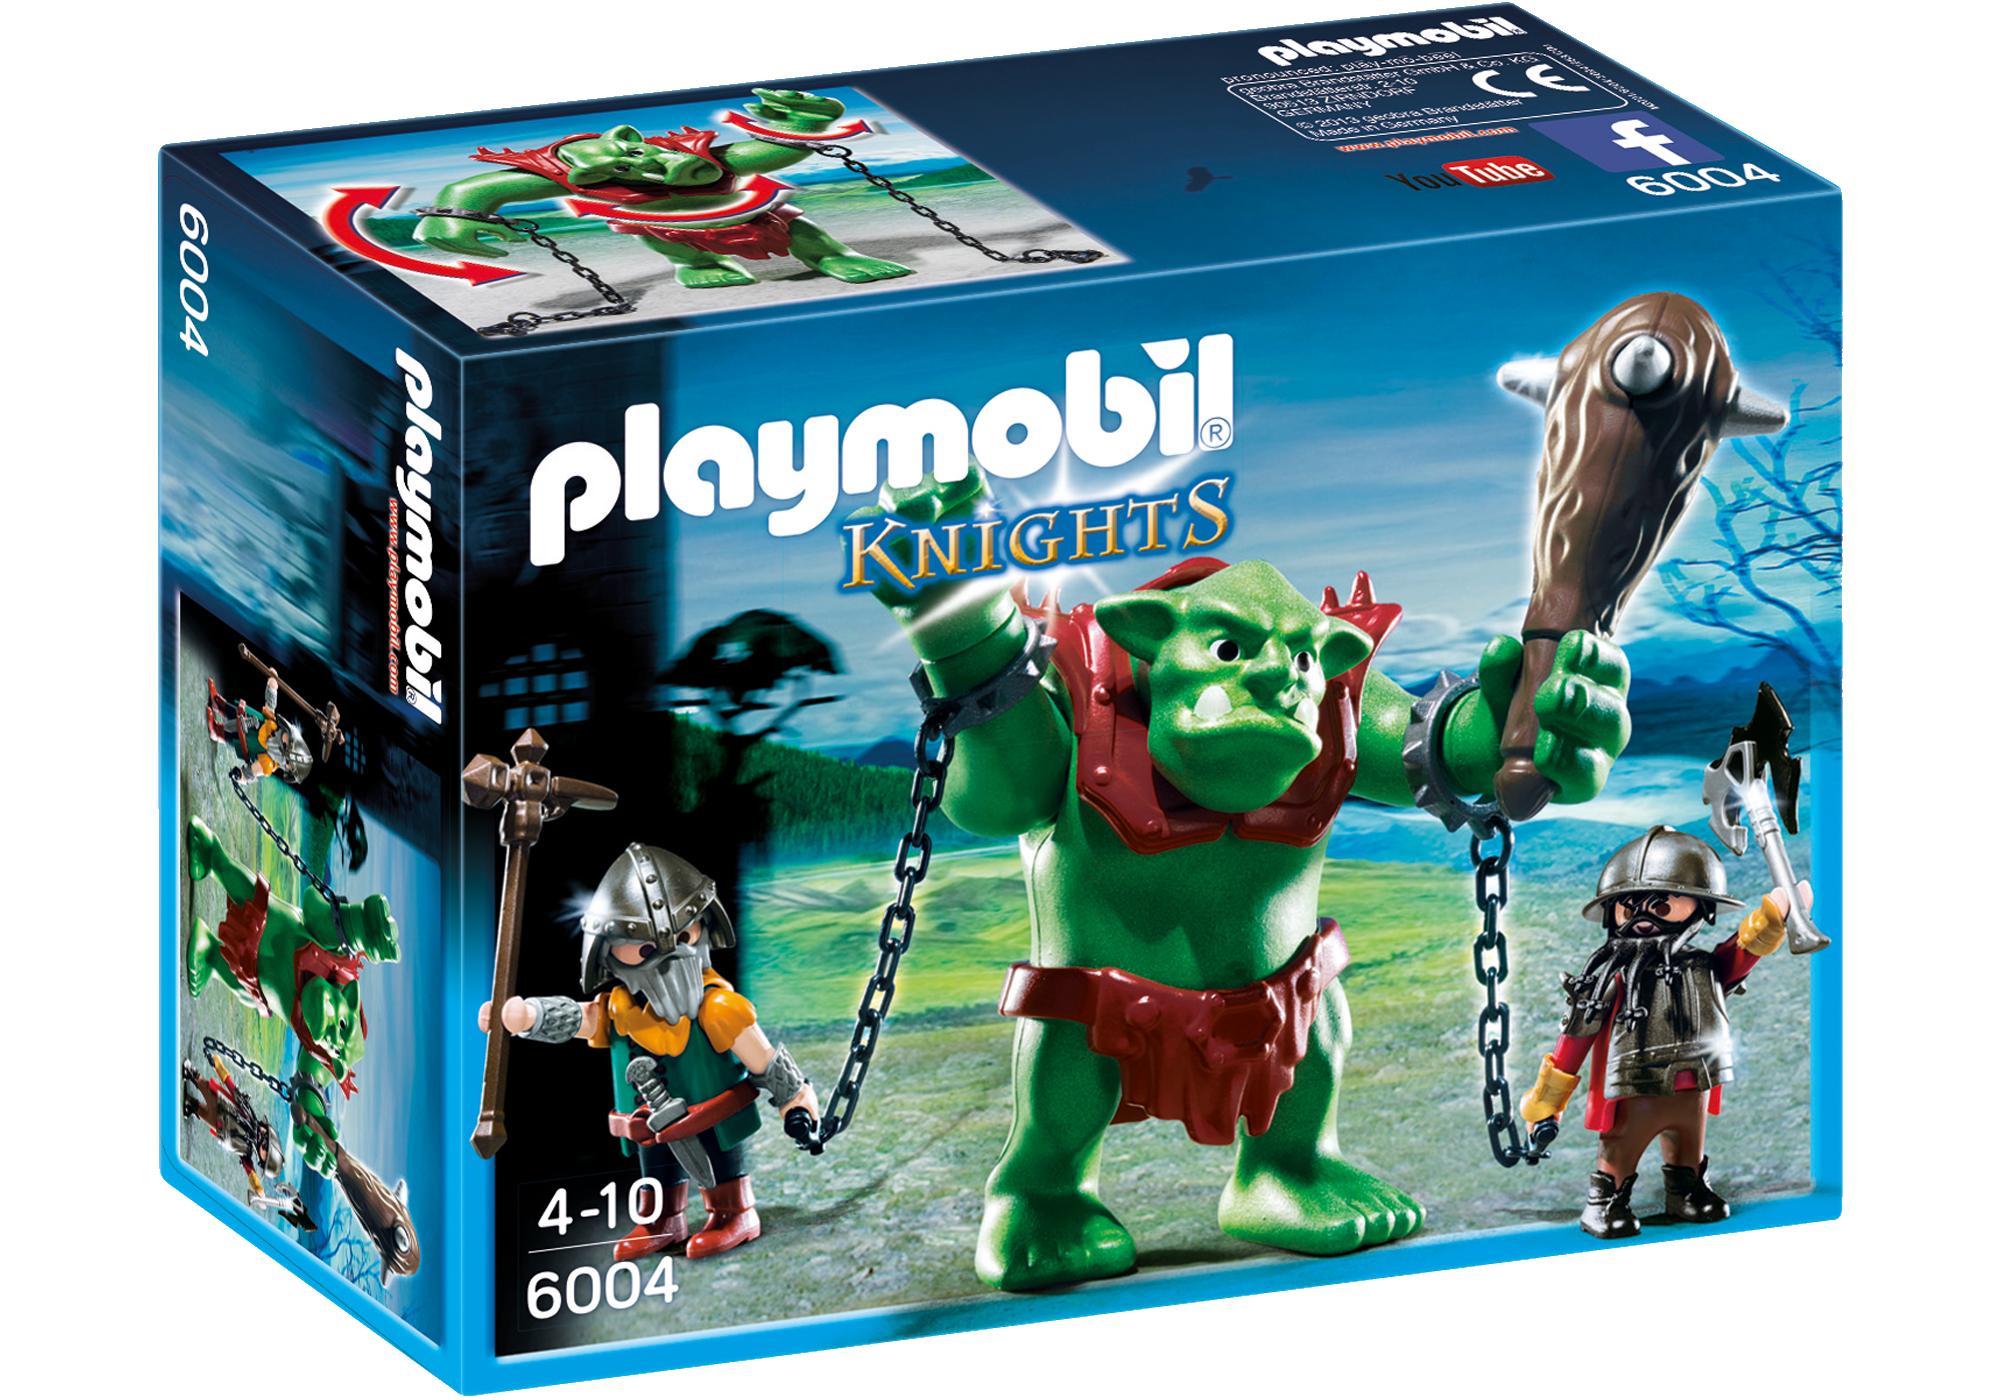 http://media.playmobil.com/i/playmobil/6004_product_box_front/Рыцари: Гигантский троль и боевые гномы